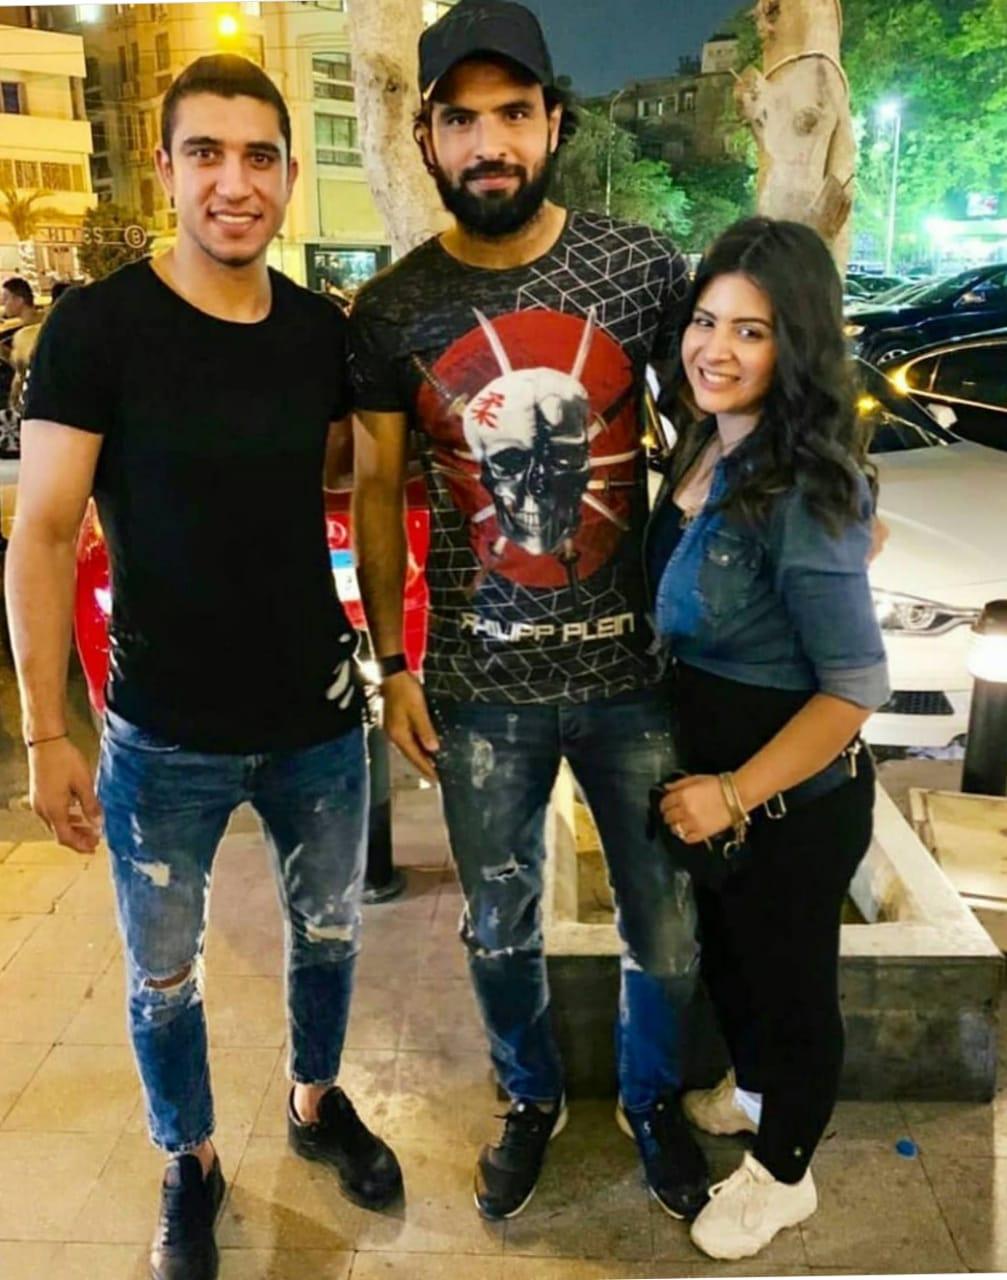 جعفر وزوجته مع احمد حسن كوكا